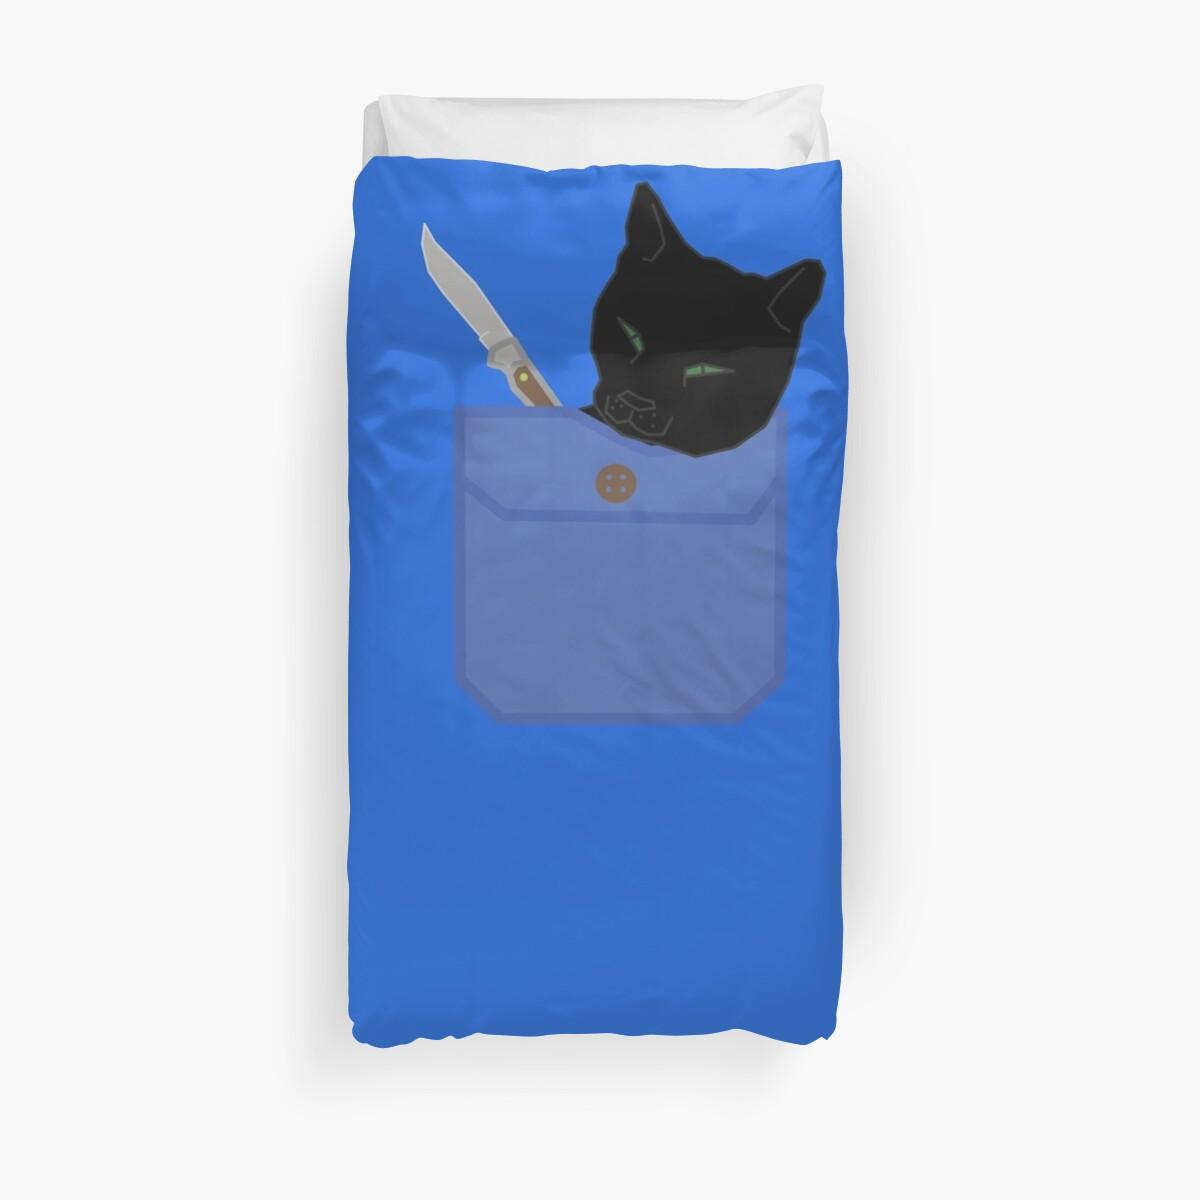 Pocket pocket knife cat by AFoxOnARock